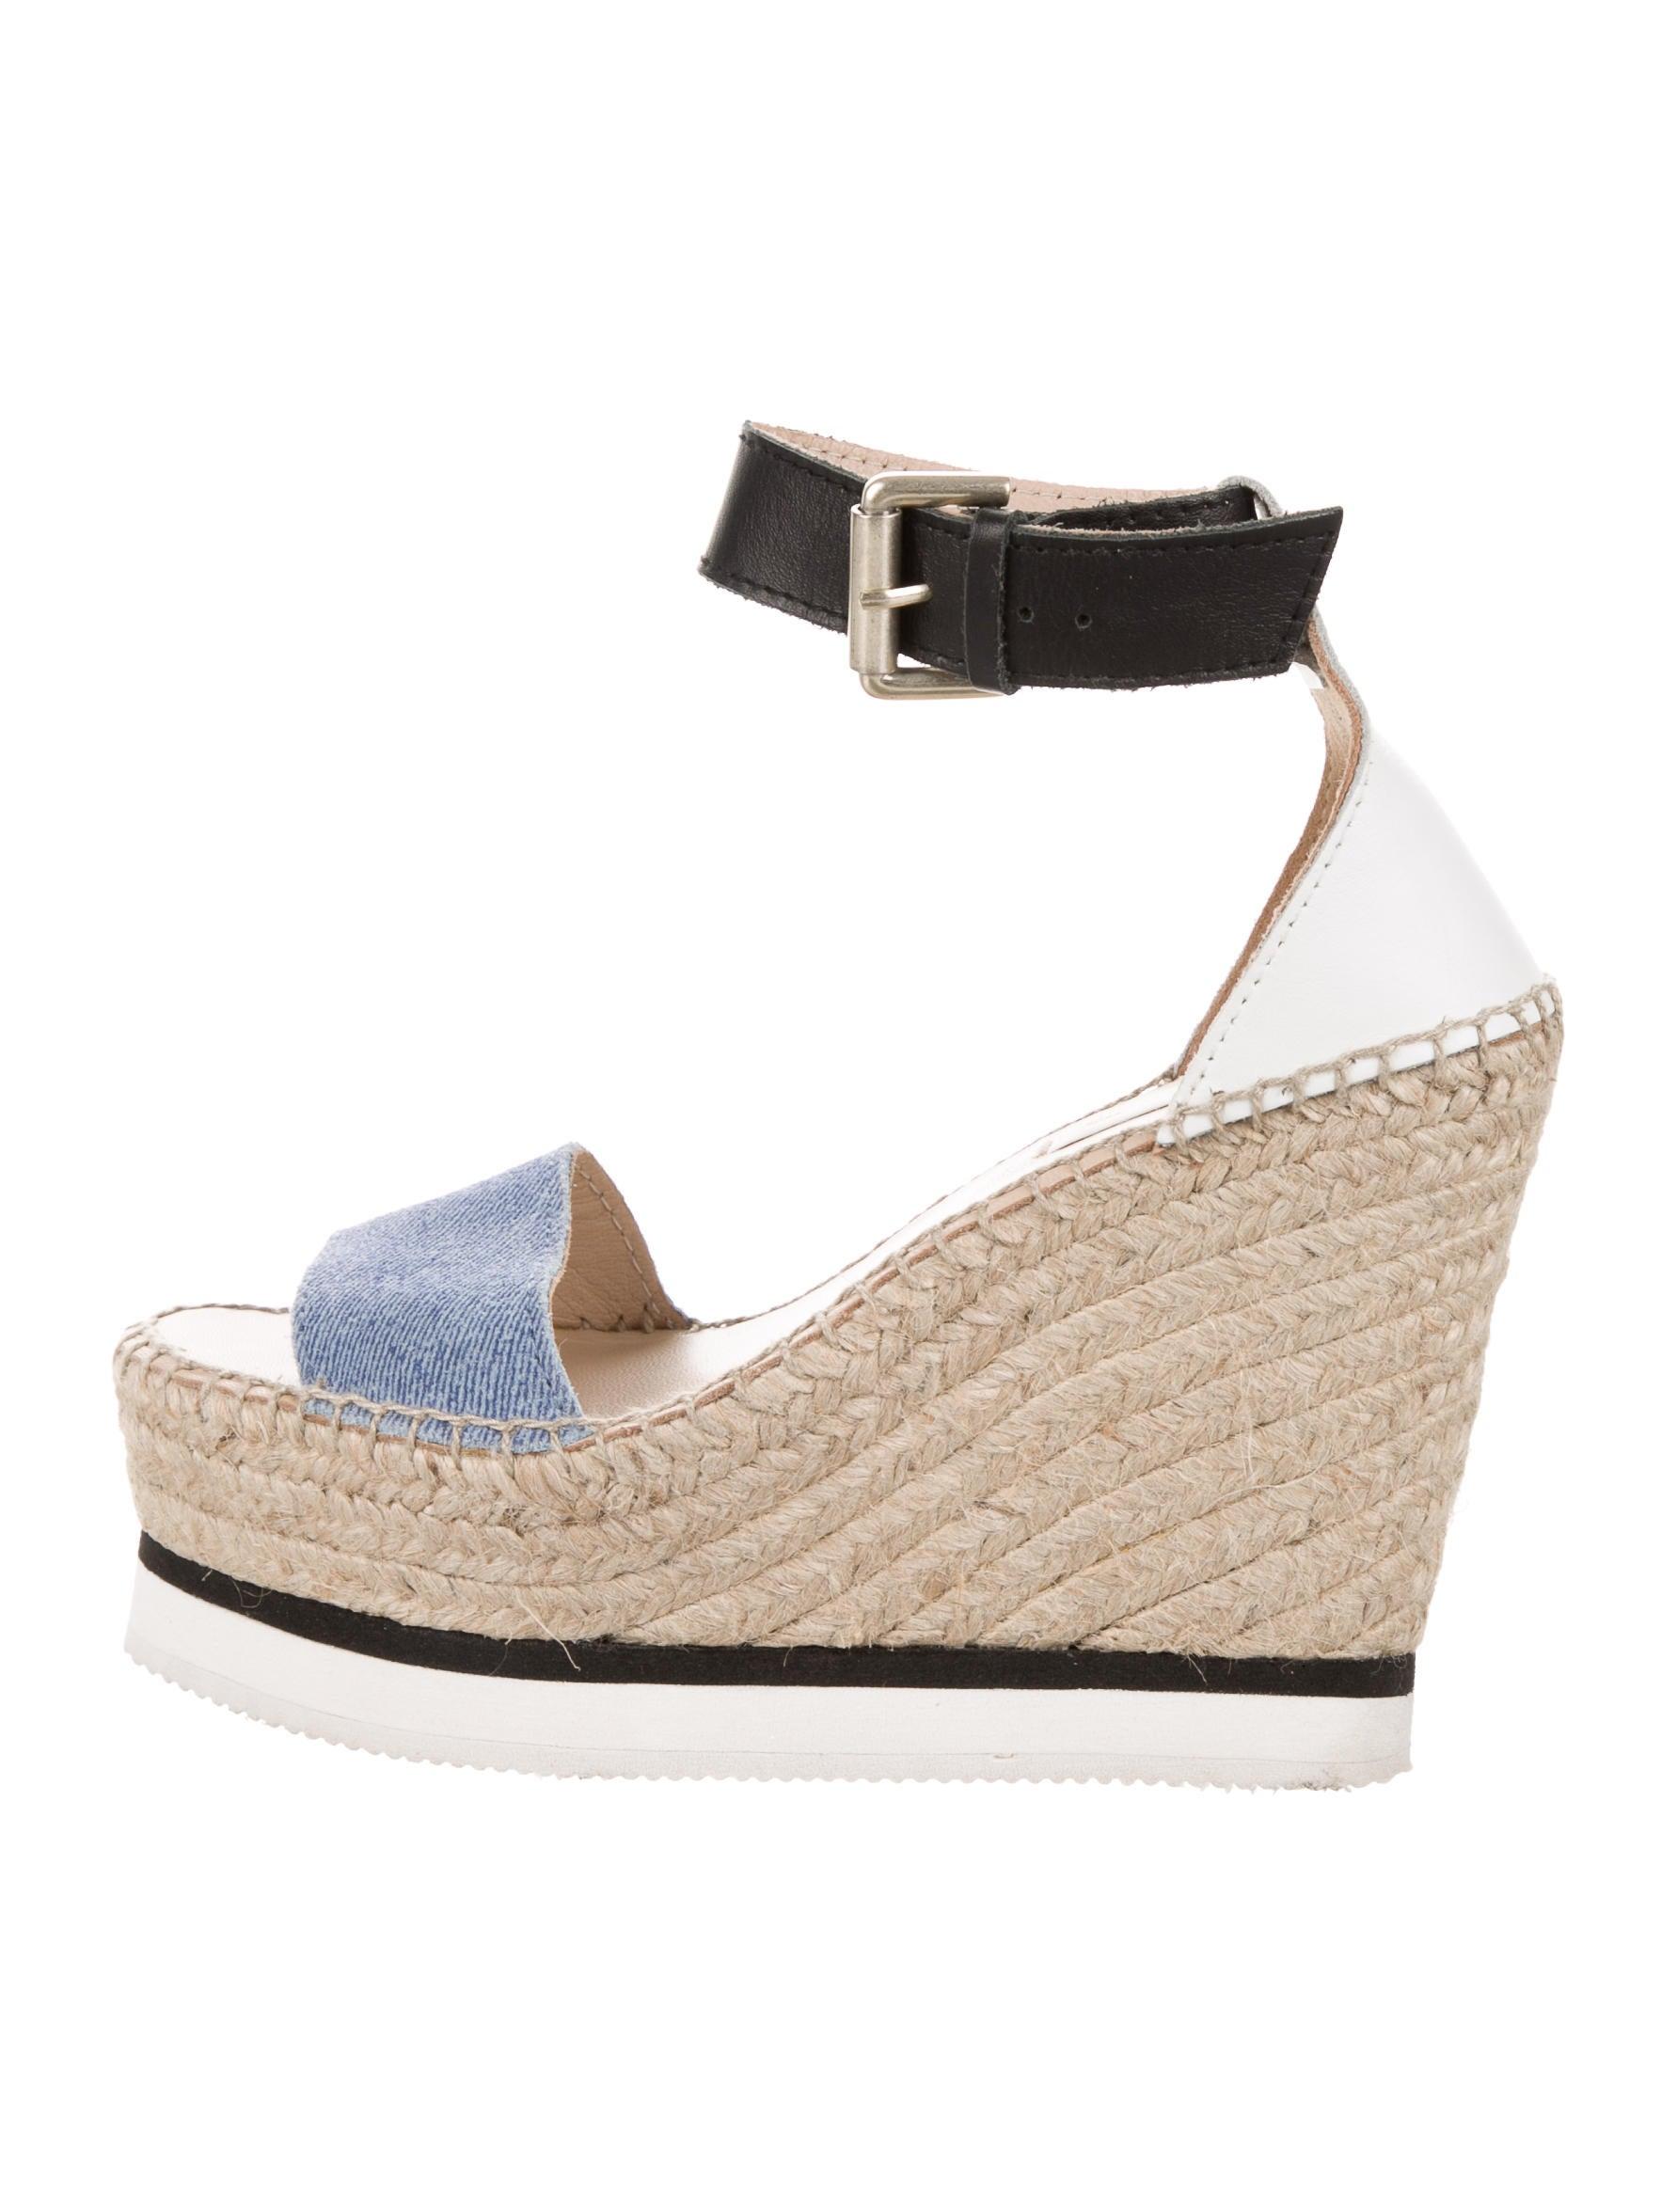 See by Chloé Denim Espadrille Sandals - Shoes